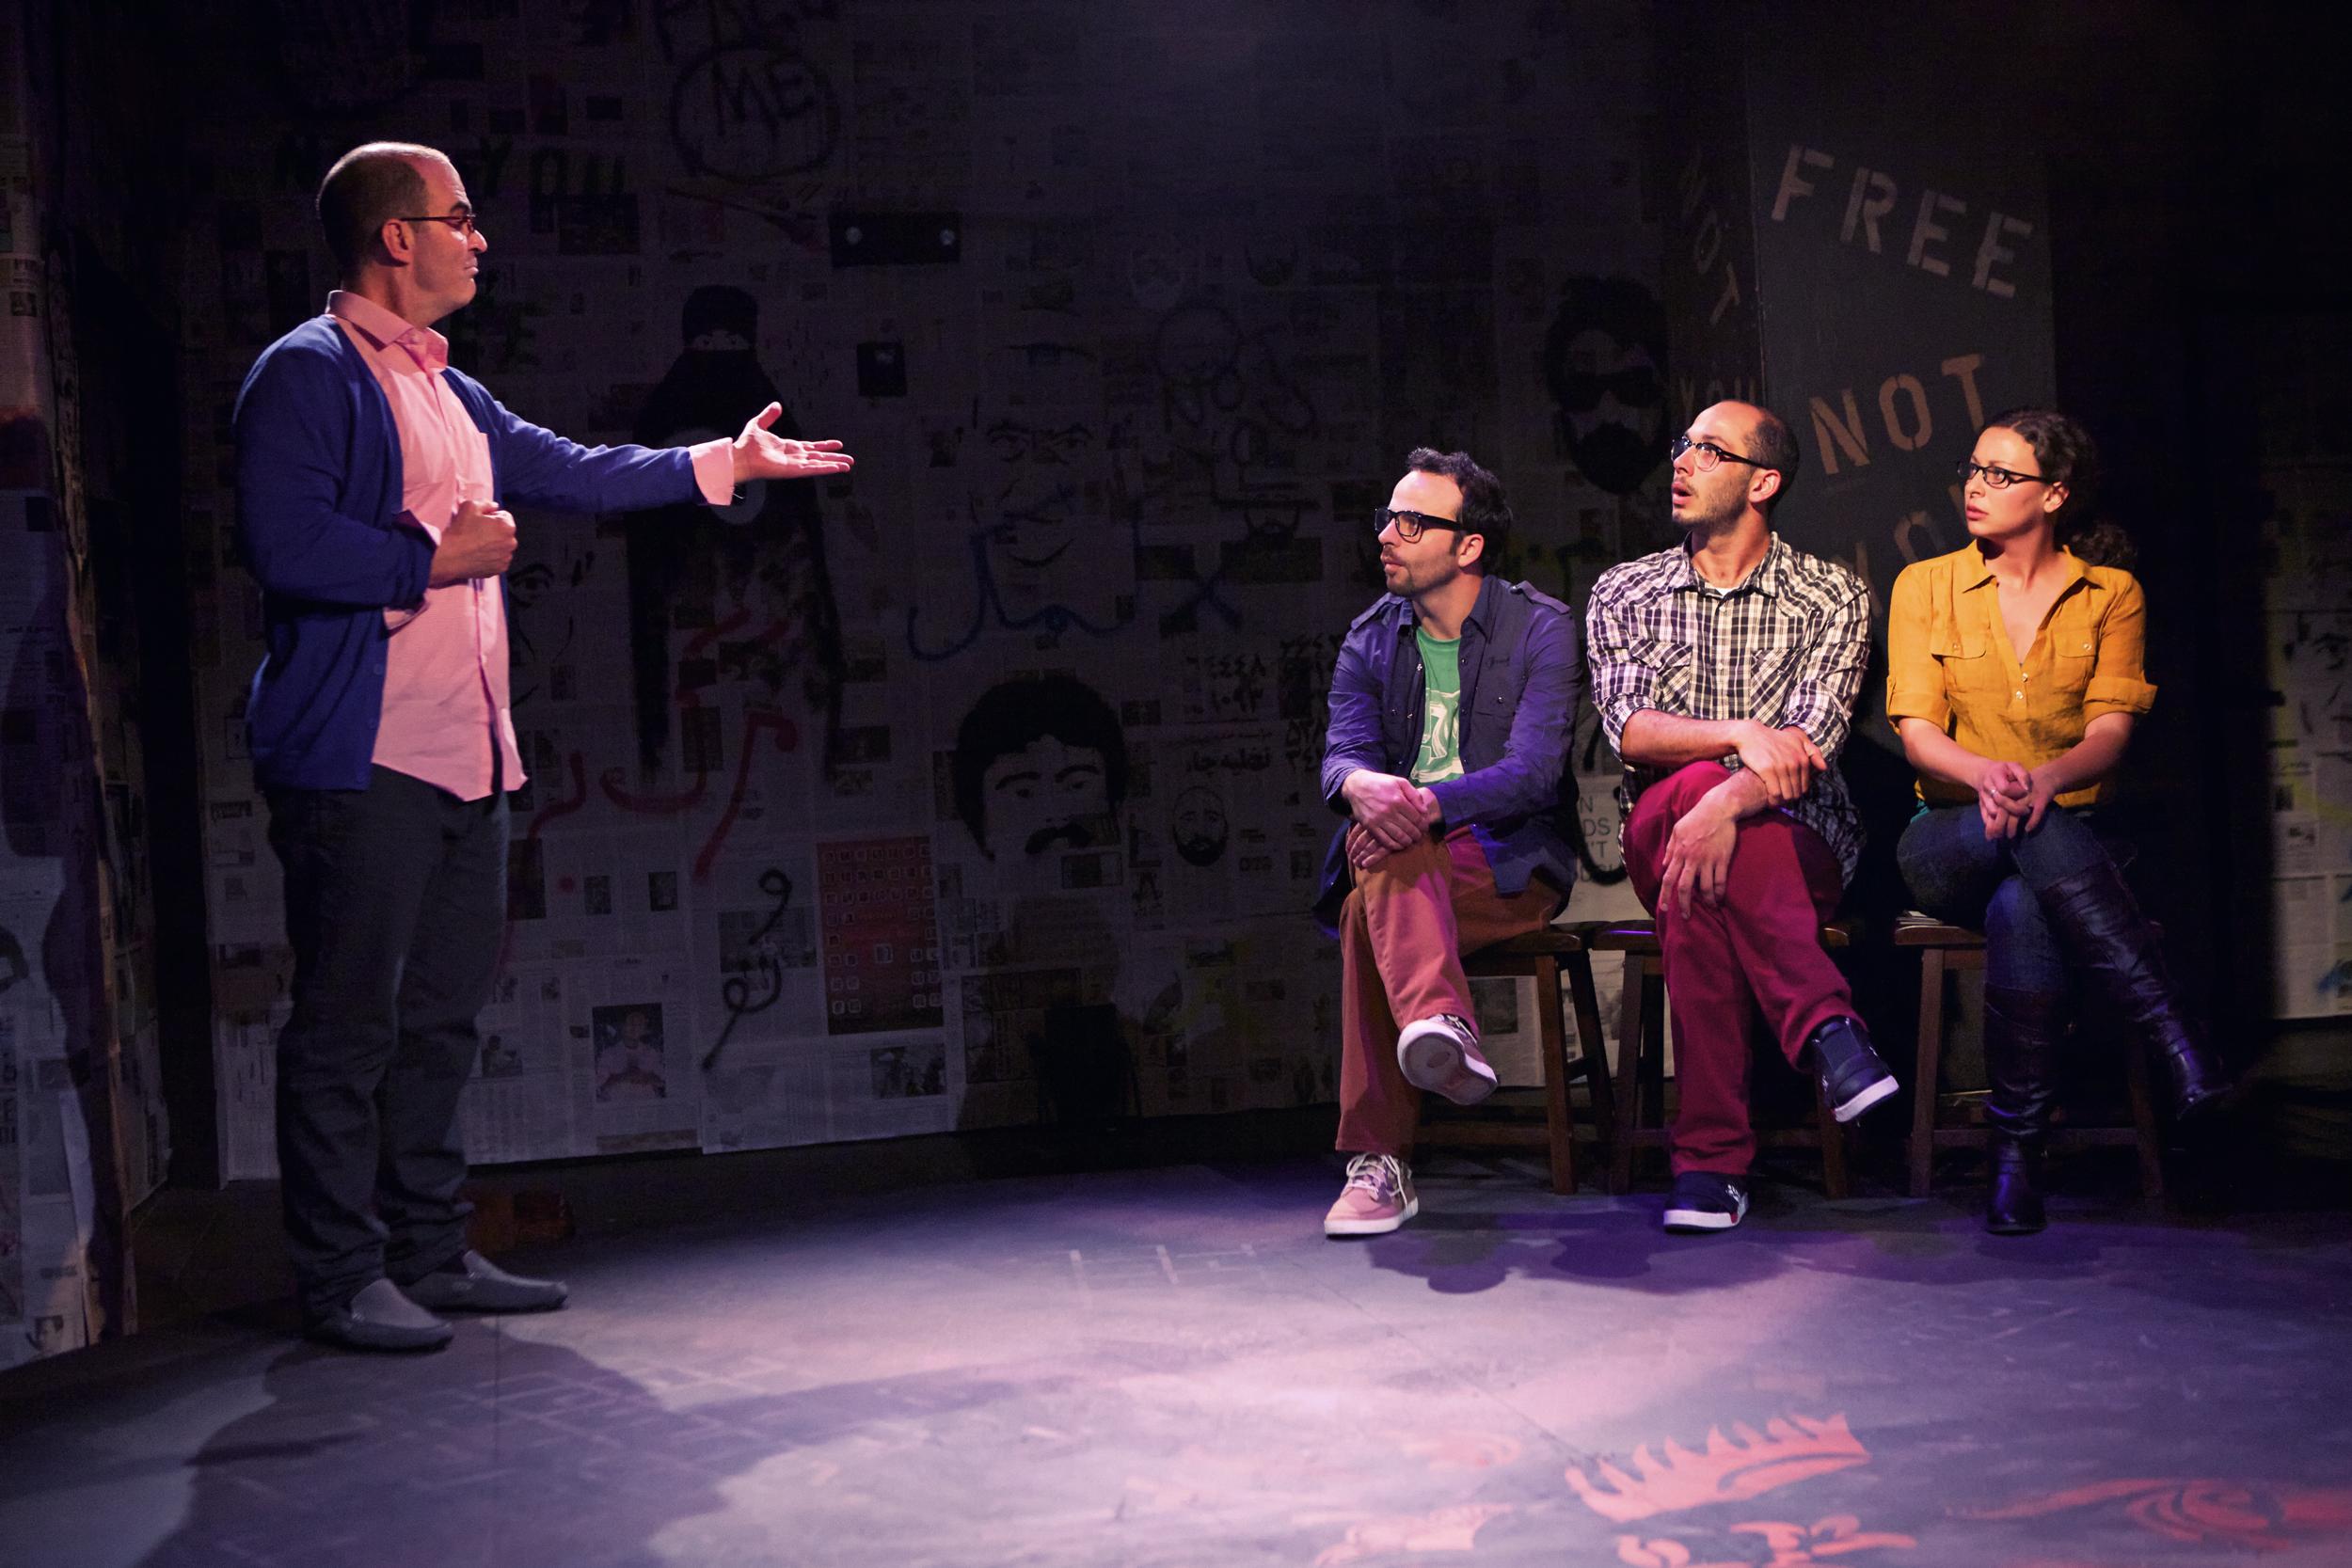 Pictured with: Lawrence Radecker, George Psarras, and Olivia Rosaldo-Pratt, Photo: Pak Han